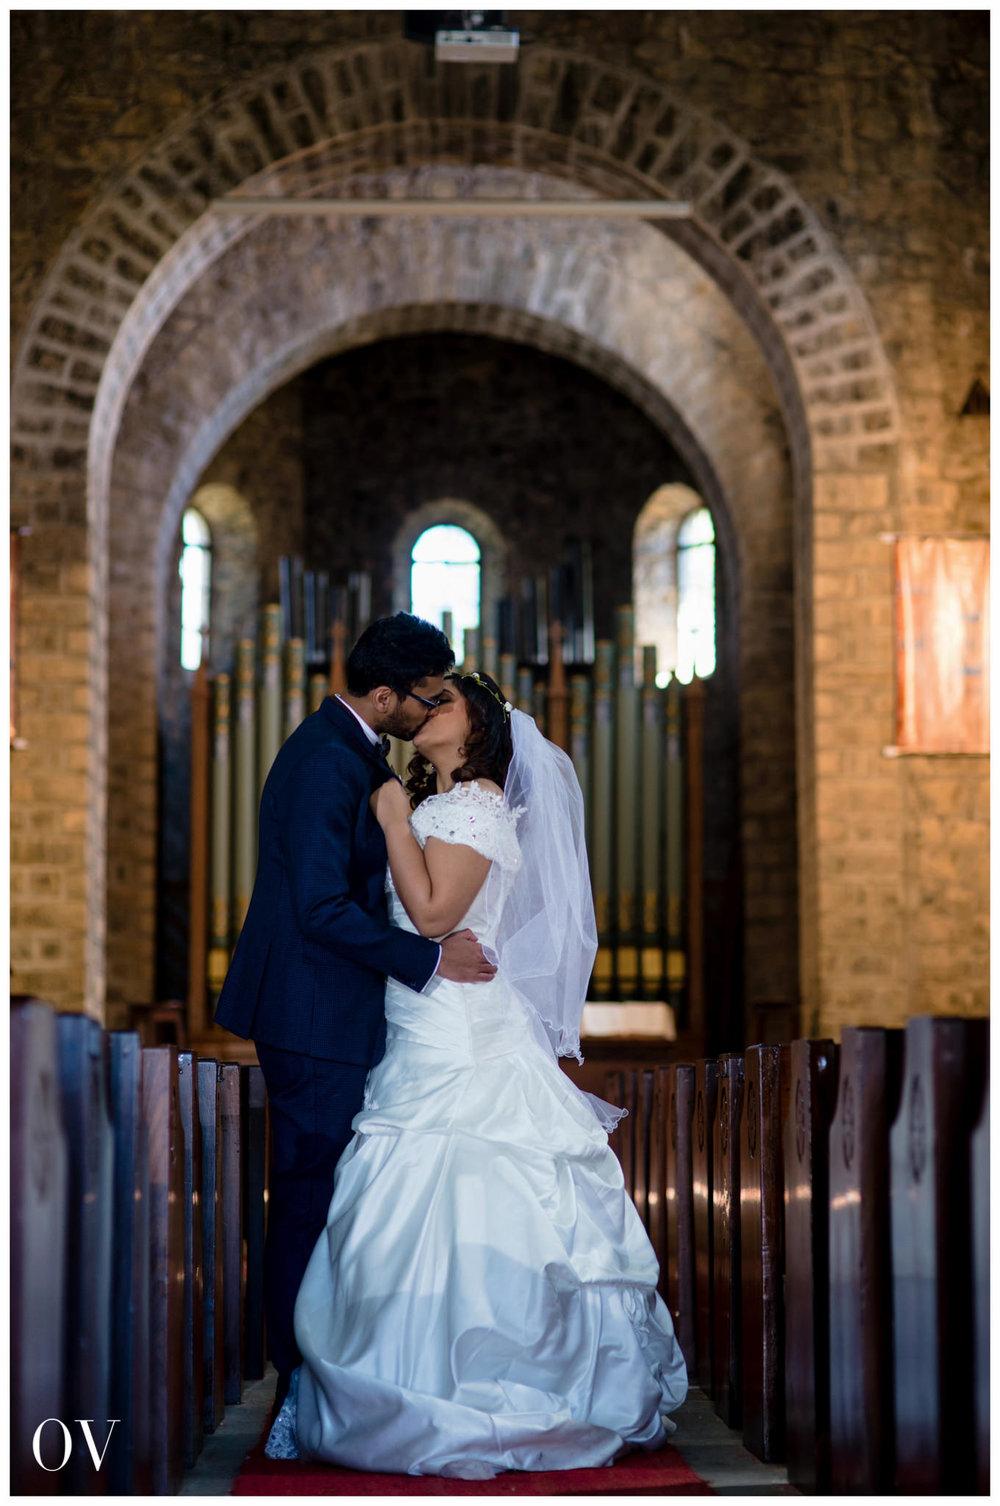 Israel Jordana-Kodaikanal Wedding-56.jpg